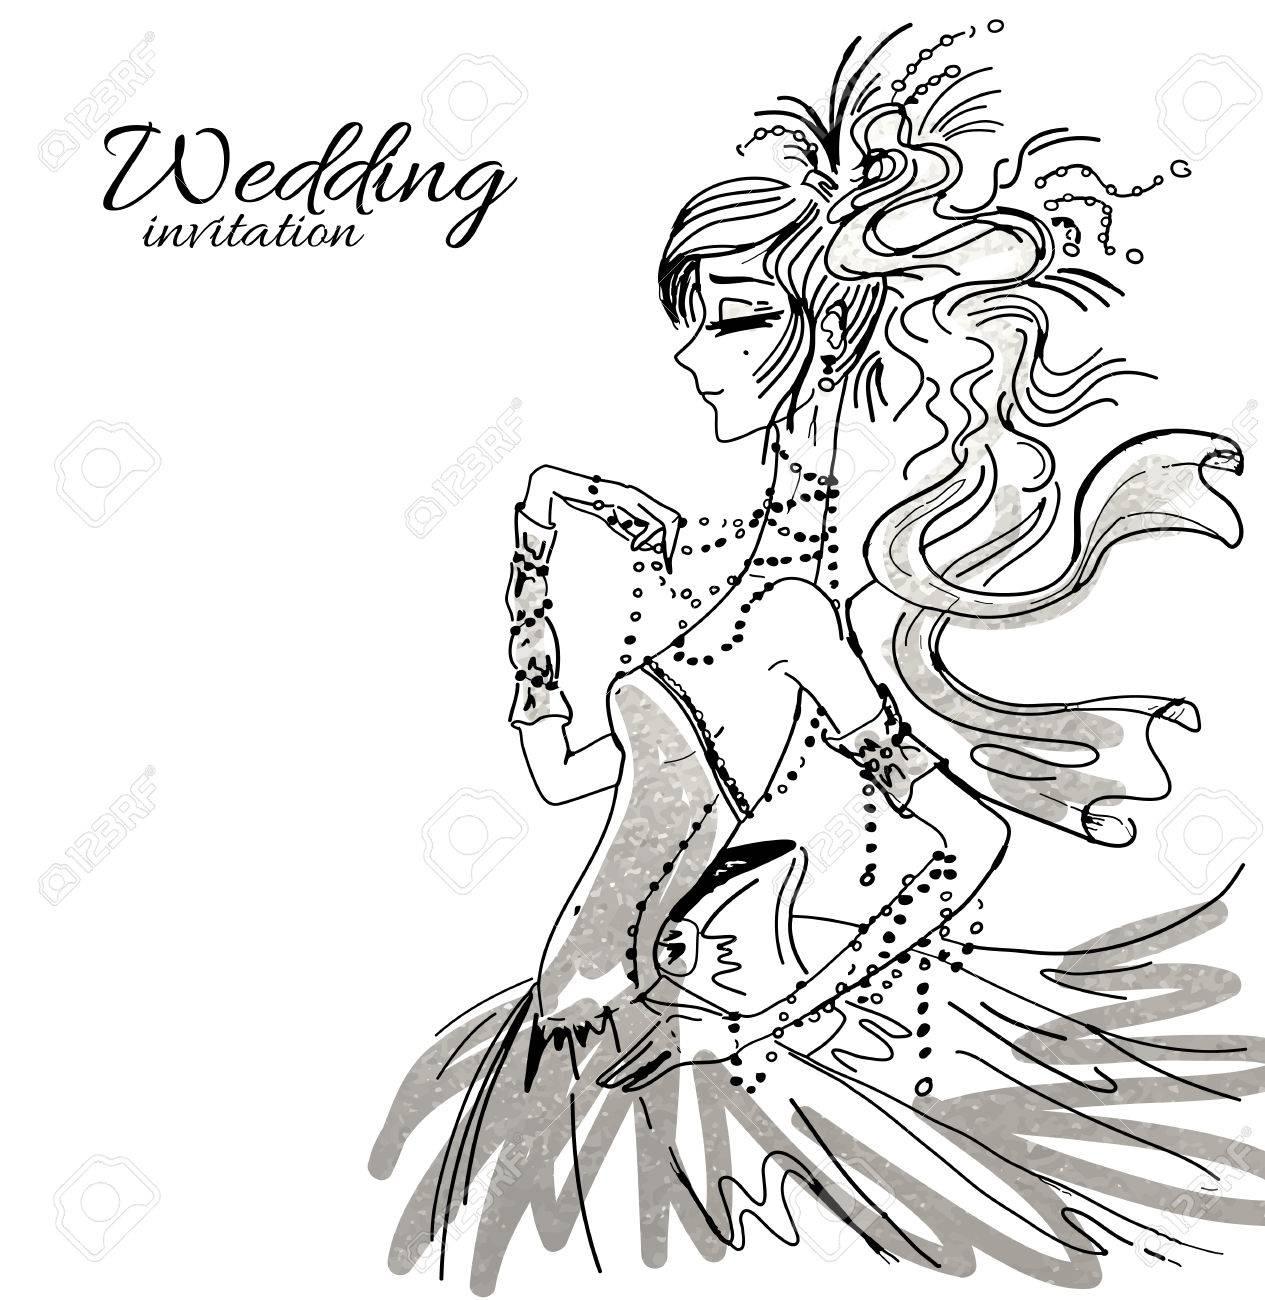 1265x1300 Vector Wedding Invitation Background Template, Hand Drawn